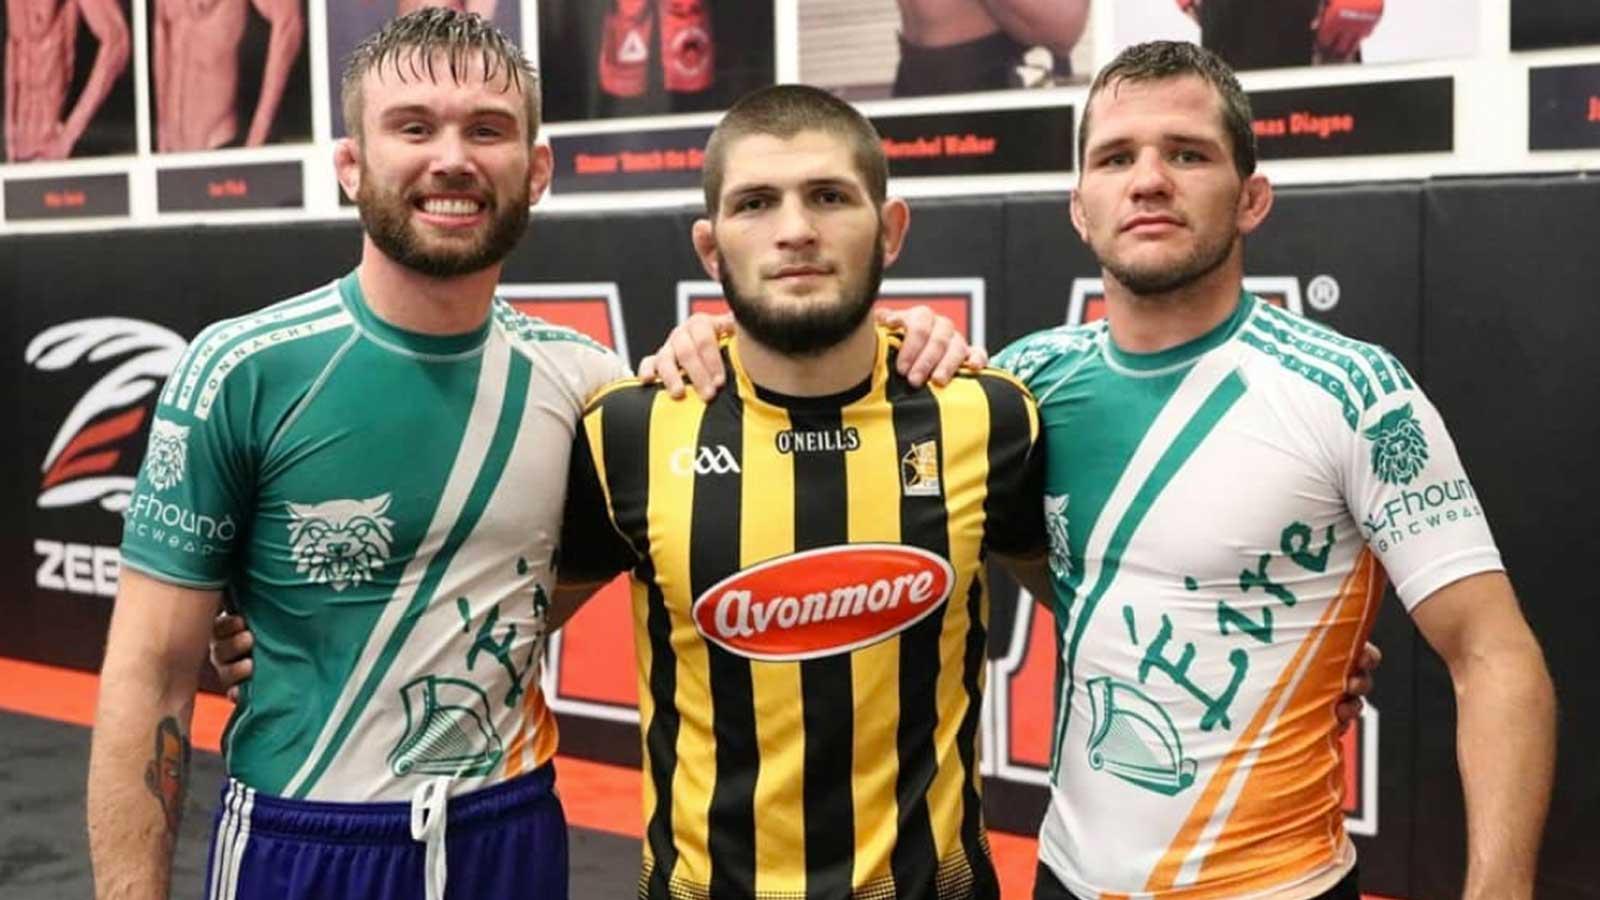 Myles Price (left) picutreed with Khabib Nurmagomedov & Adam Piccolotti. Photo: @myles_splinter_price/@frujuice_athletics